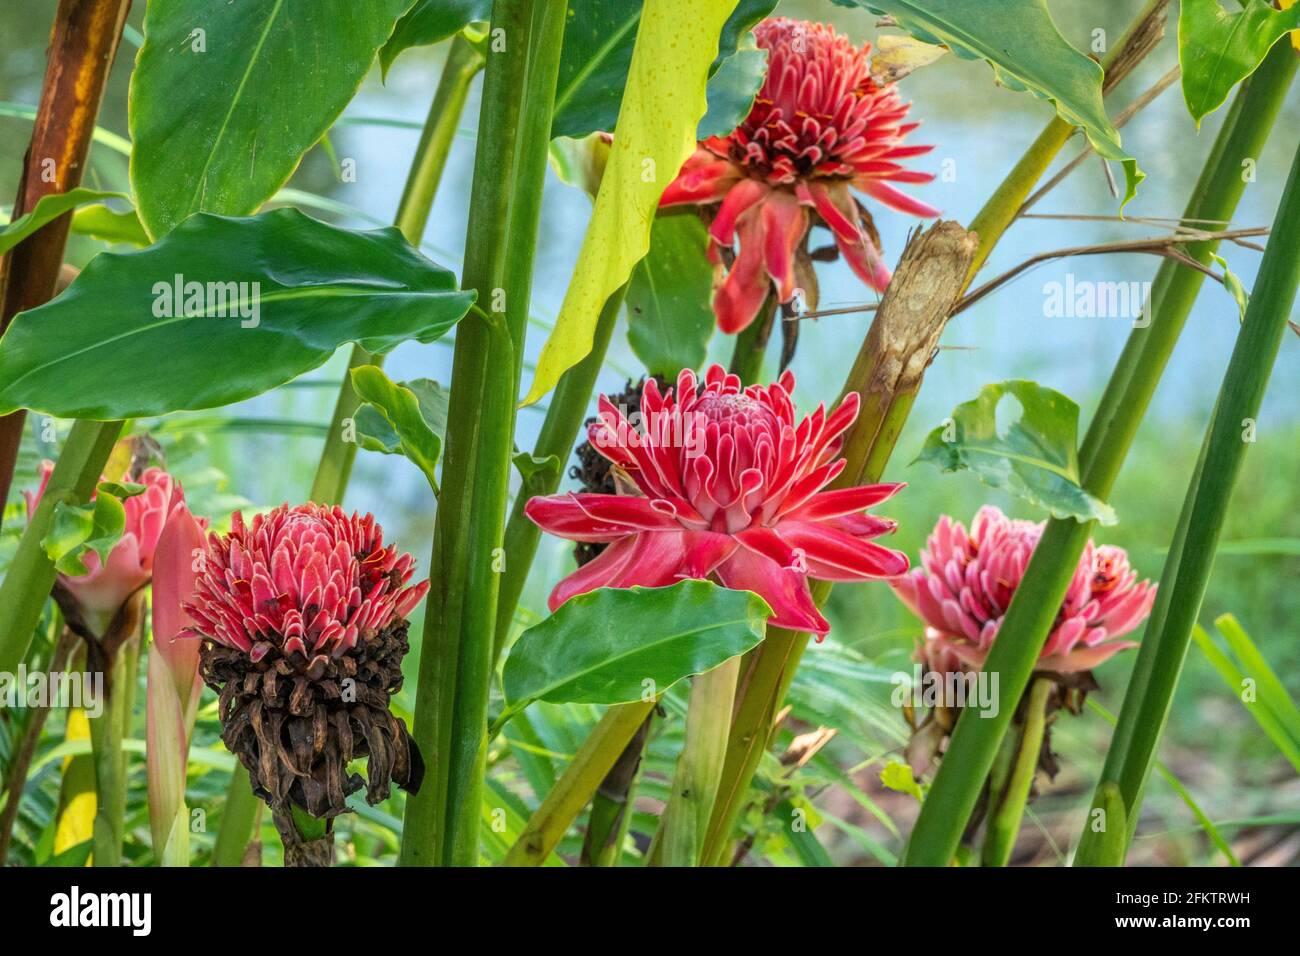 Antorcha roja jengibre (Etlingera elatior) flor, Abba Paradise, Taiton, Bau, Sarawak, Malasia Oriental Foto de stock